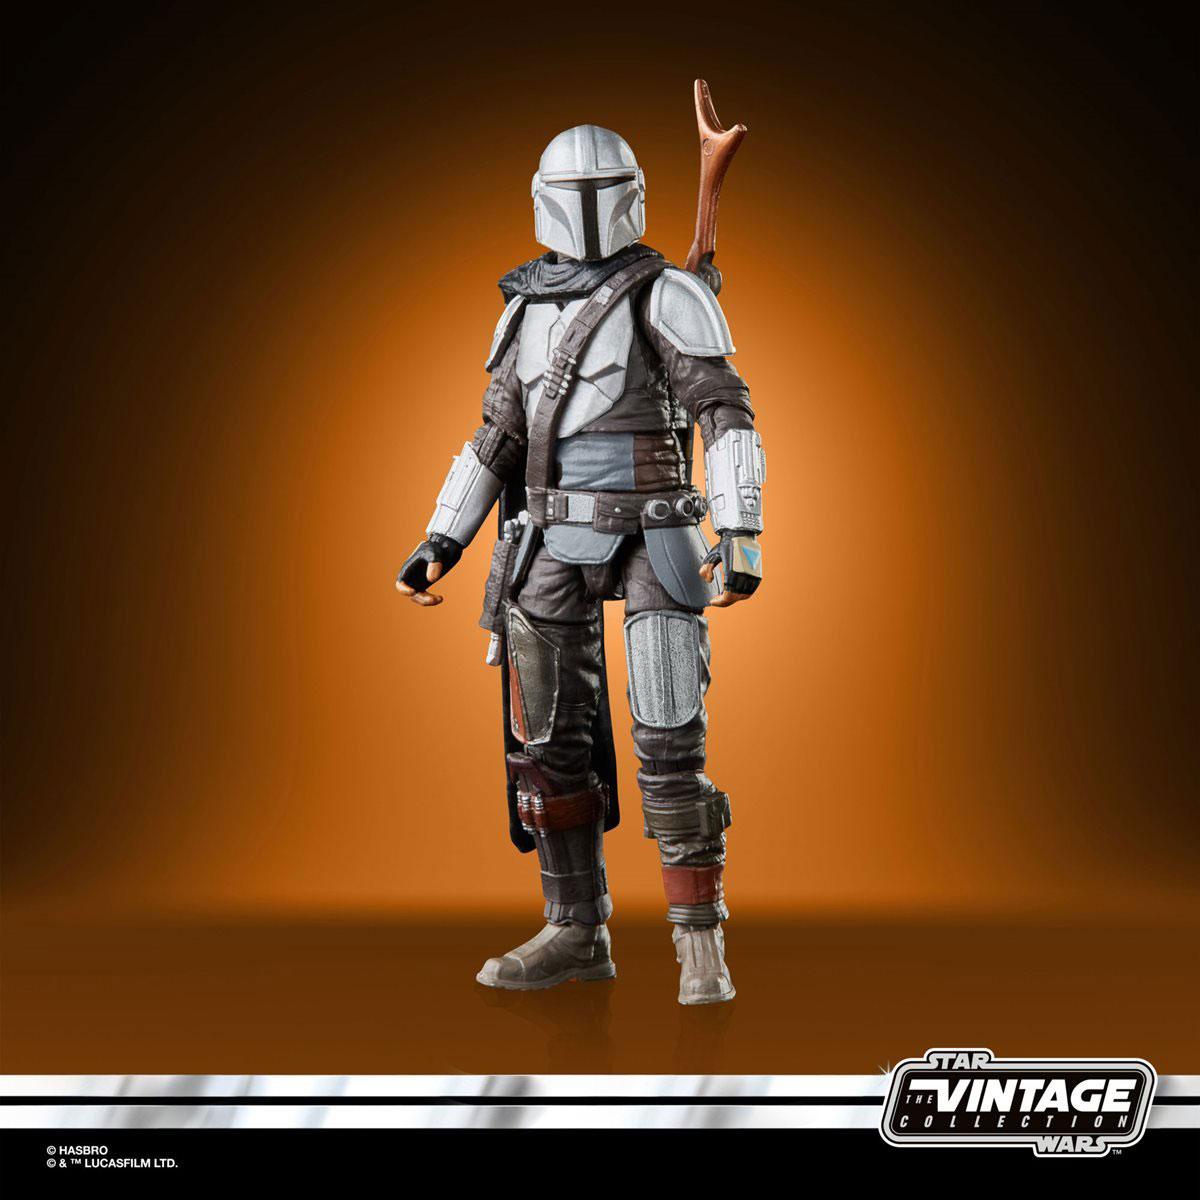 star-wars-vintage-collection-mandalorian-in-beskar-armor-action-figure-4